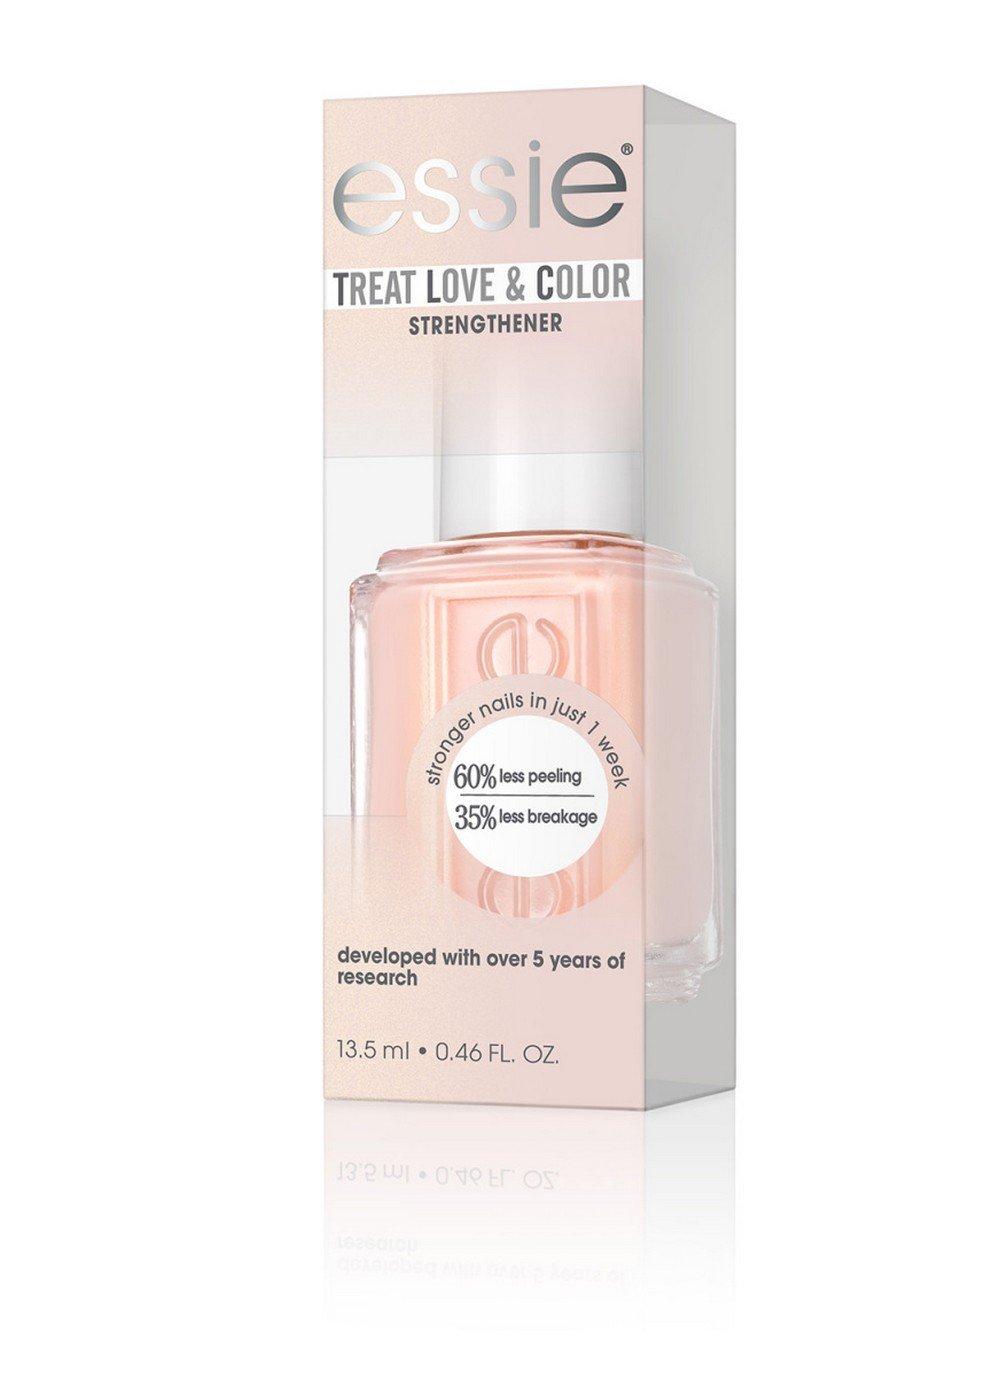 Essie Treat Love & Color Endurecedor para Uñas Tono 30 Minimally Modest - 13.5 ml L'Oréal 30156975